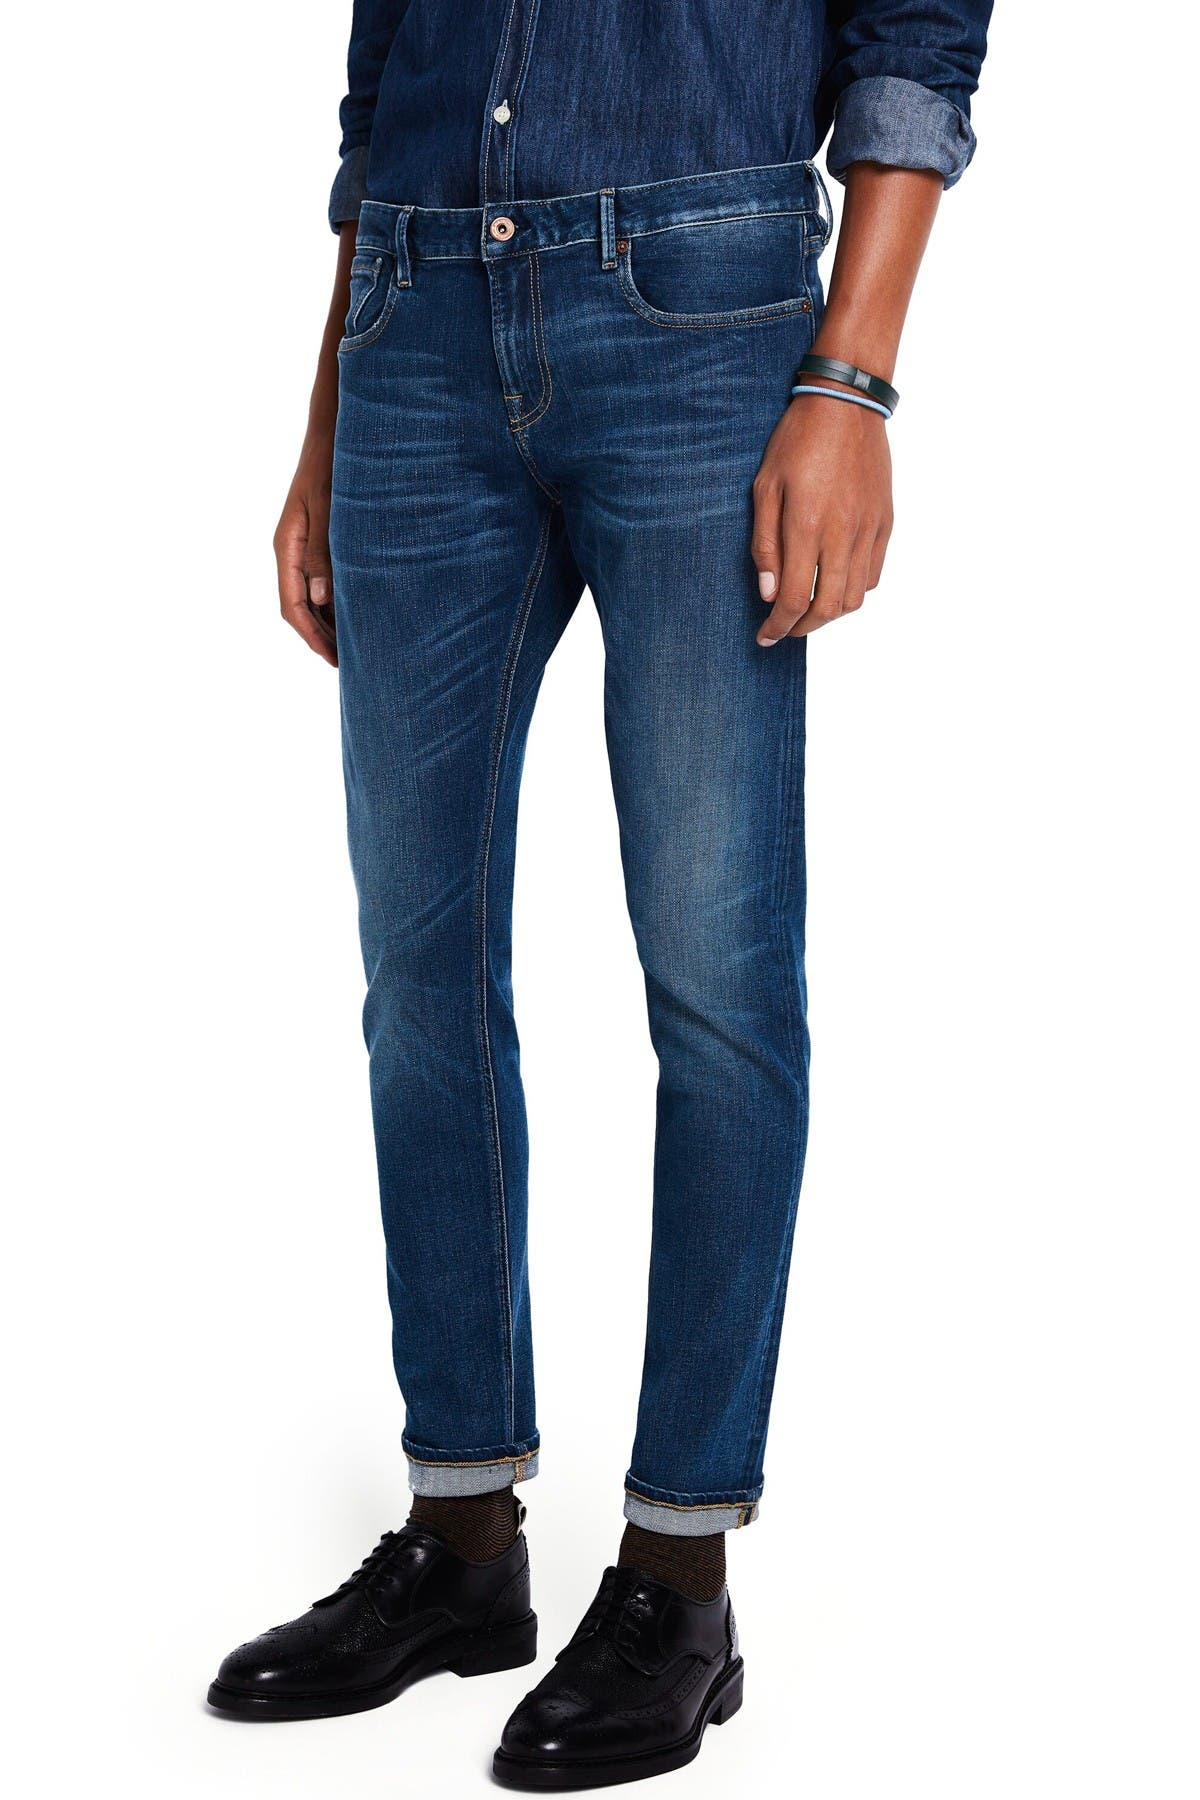 Image of Scotch & Soda Tye Lucky Blauw Dark Slim Tapered Fit Jeans